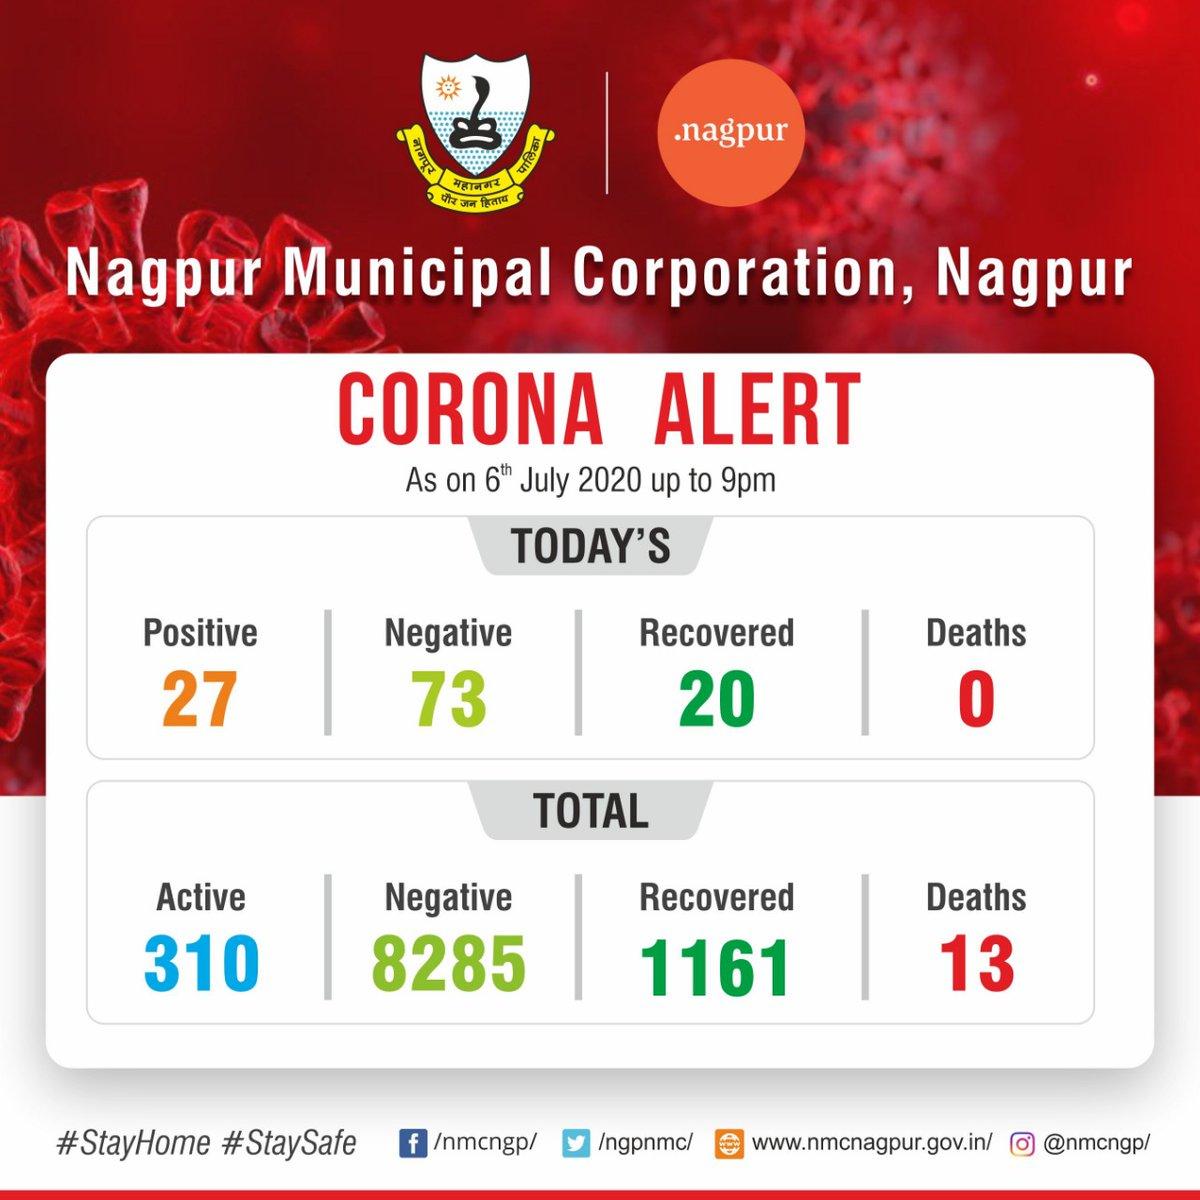 NMC #Covid_19 alert: total status update of the COVID19 cases as on 6 July 2020 #CoronaUpdatesInIndia #WarAgainstVirus #IndiaFightsCoronavirus https://t.co/shhPYyxRVf